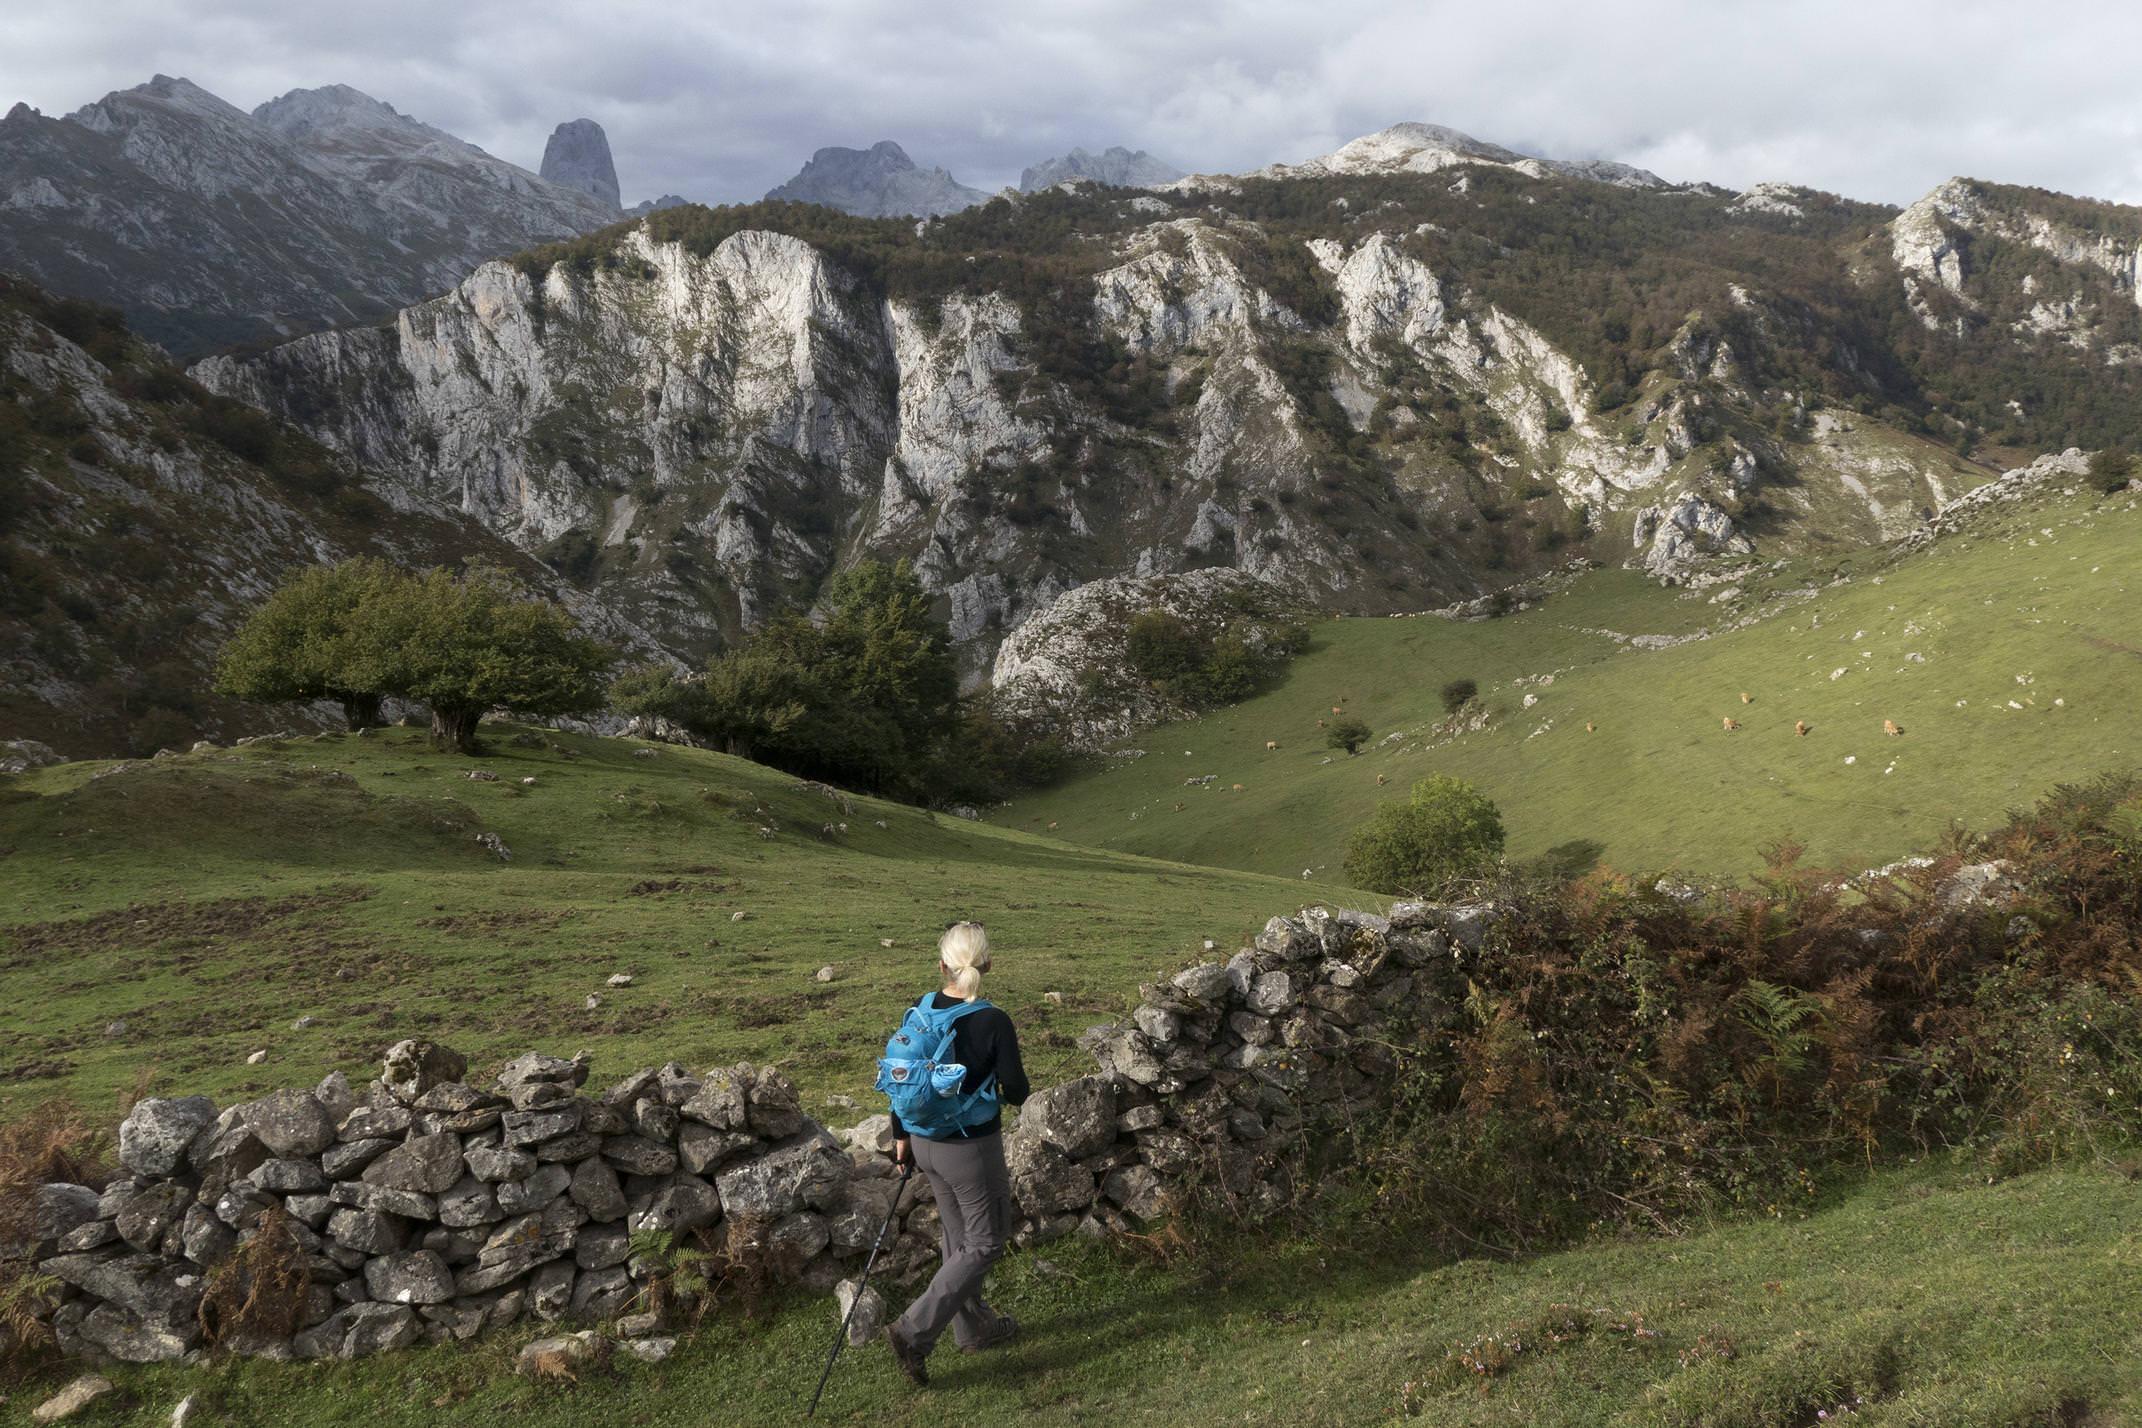 Spain picos de europa asturias cabrales caoru roman route urriellu naranjo valfrio hiker c diego